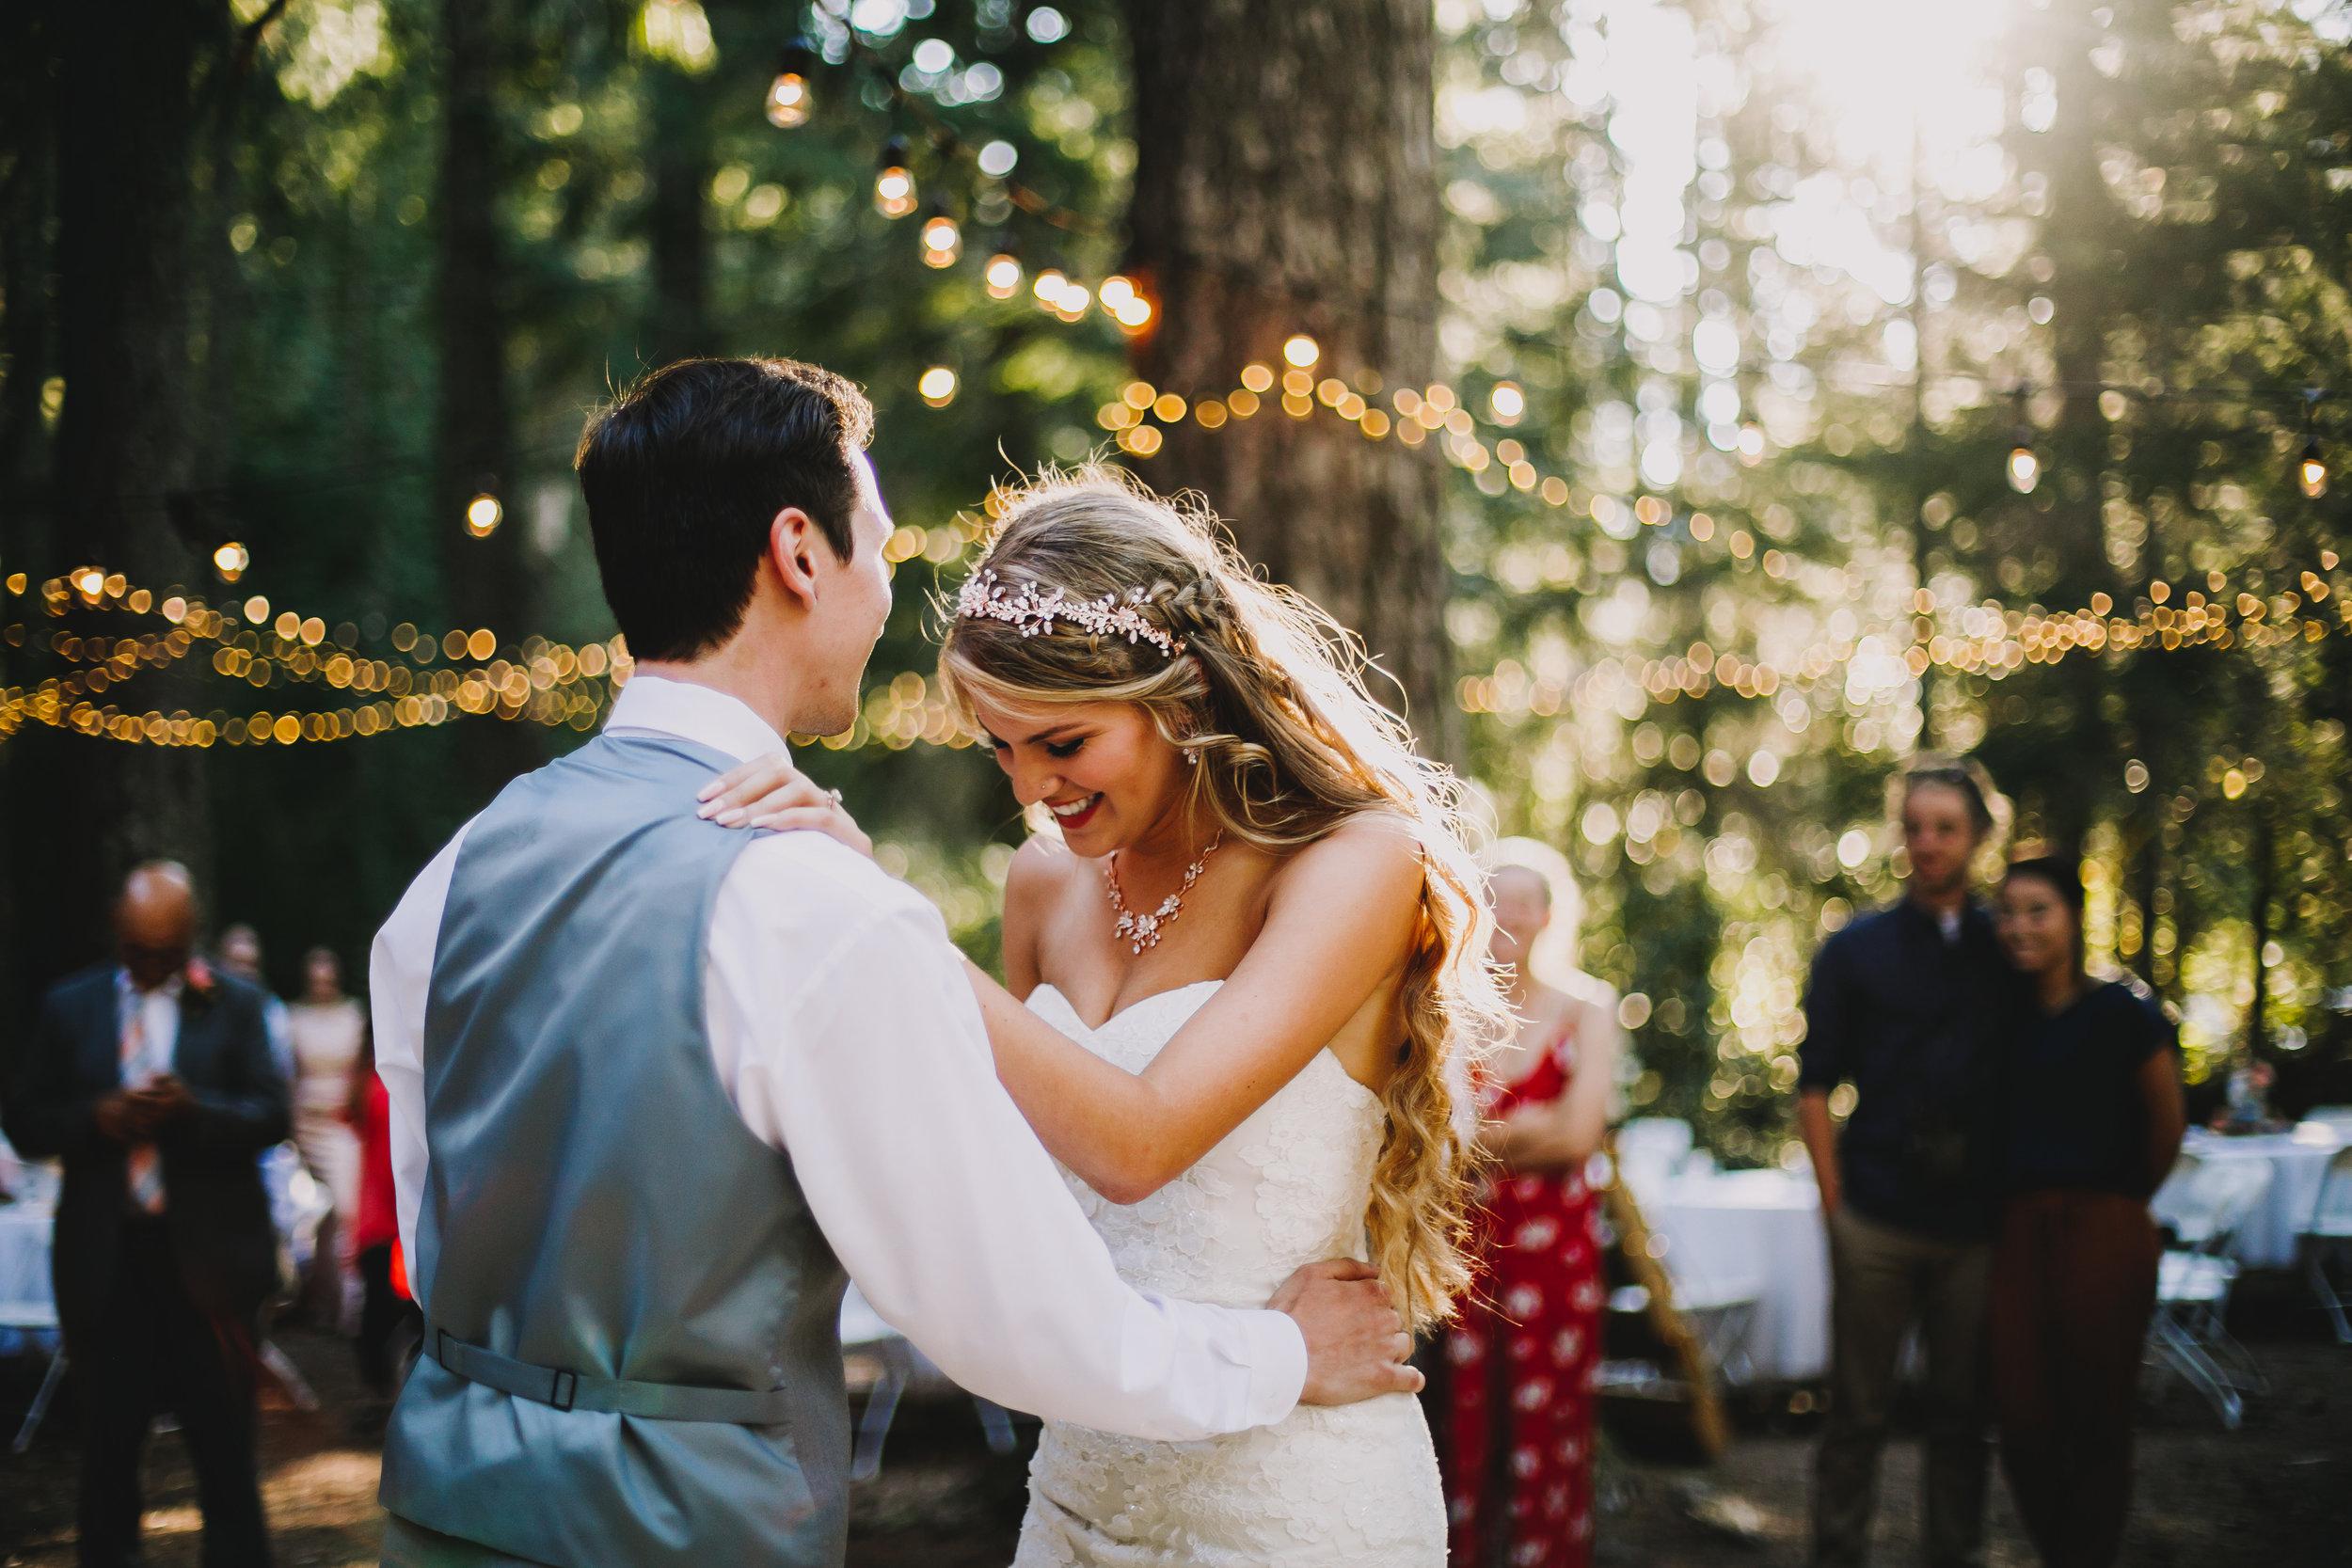 Archer Inspired Photography Sarah and Shaun Wedding Mt Hood Oregon-427.jpg